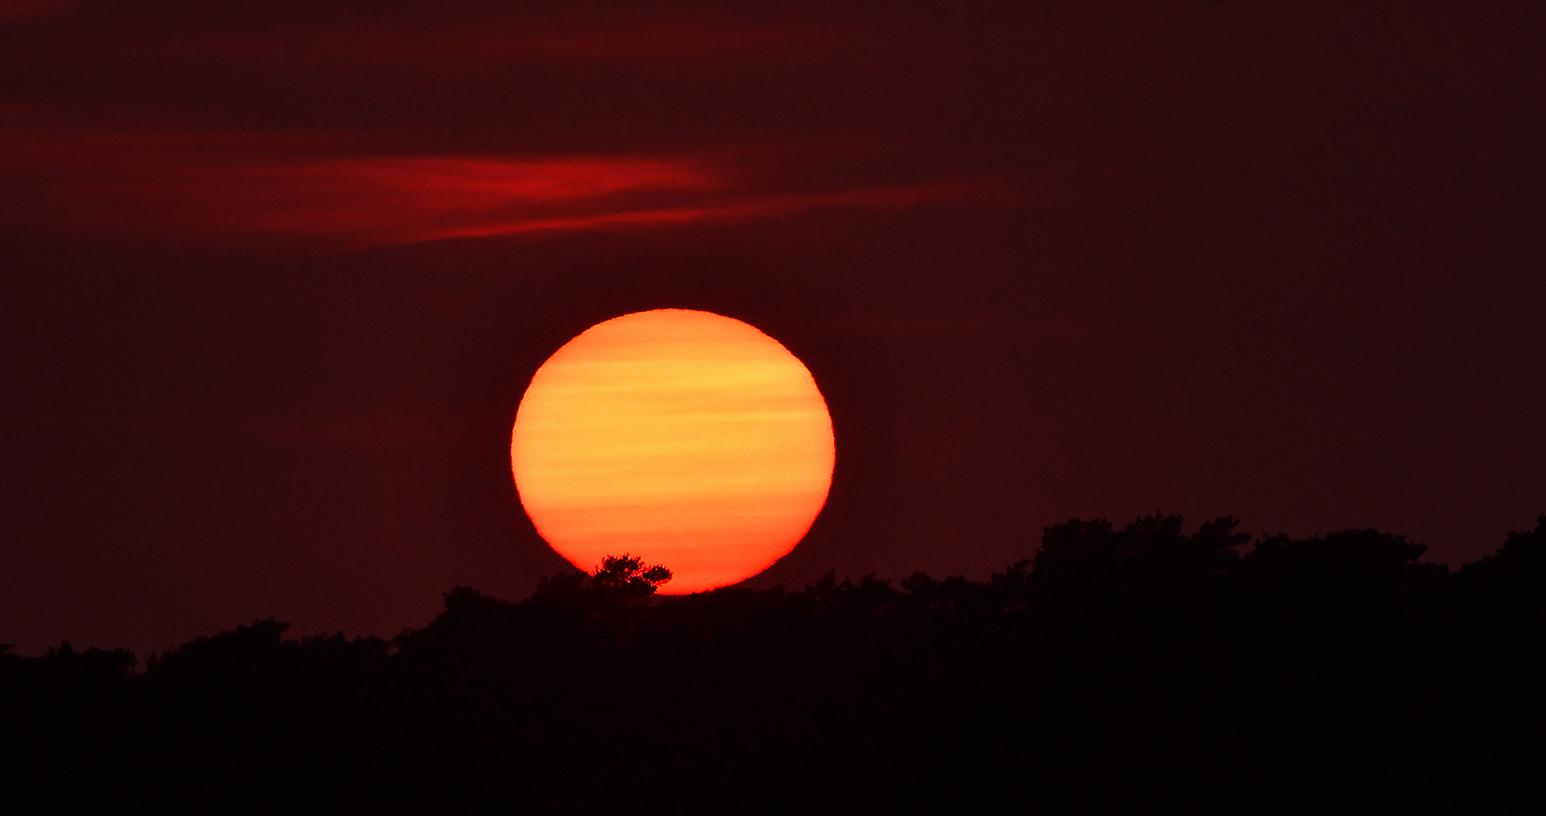 De avondzon zakt langzaam maar zeker achter de bosrand - Foto: ©Louis Fraanje